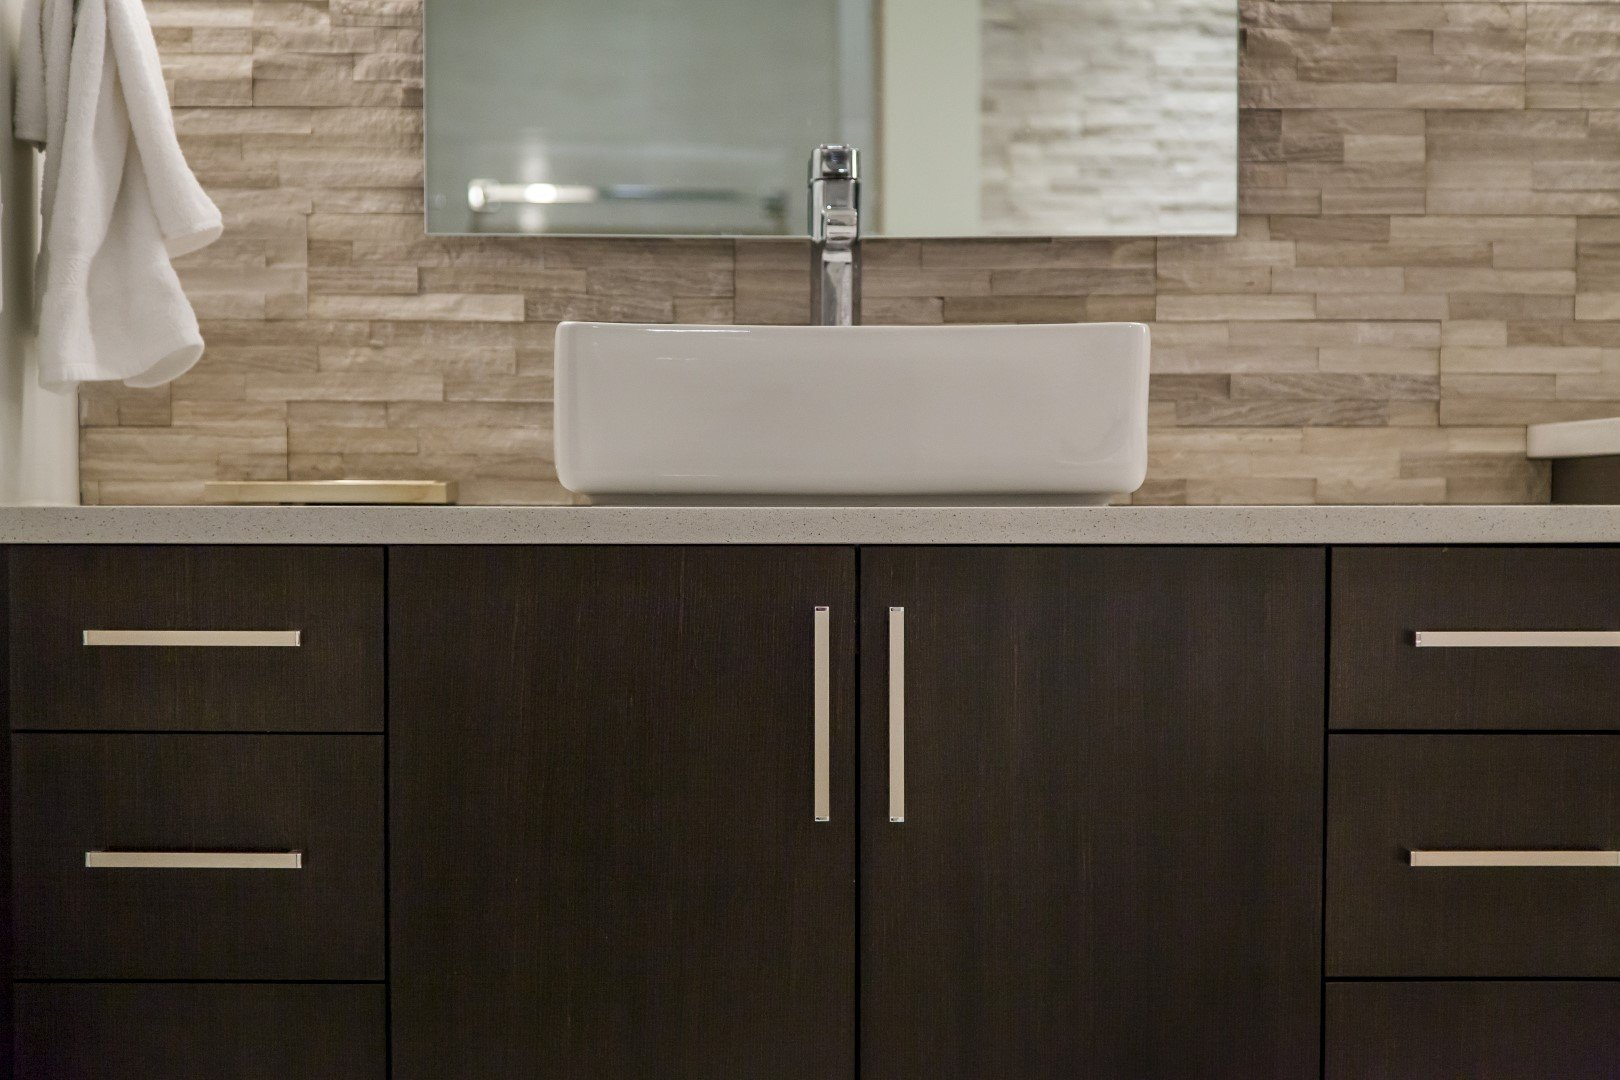 Modern Home Bathroom Sink